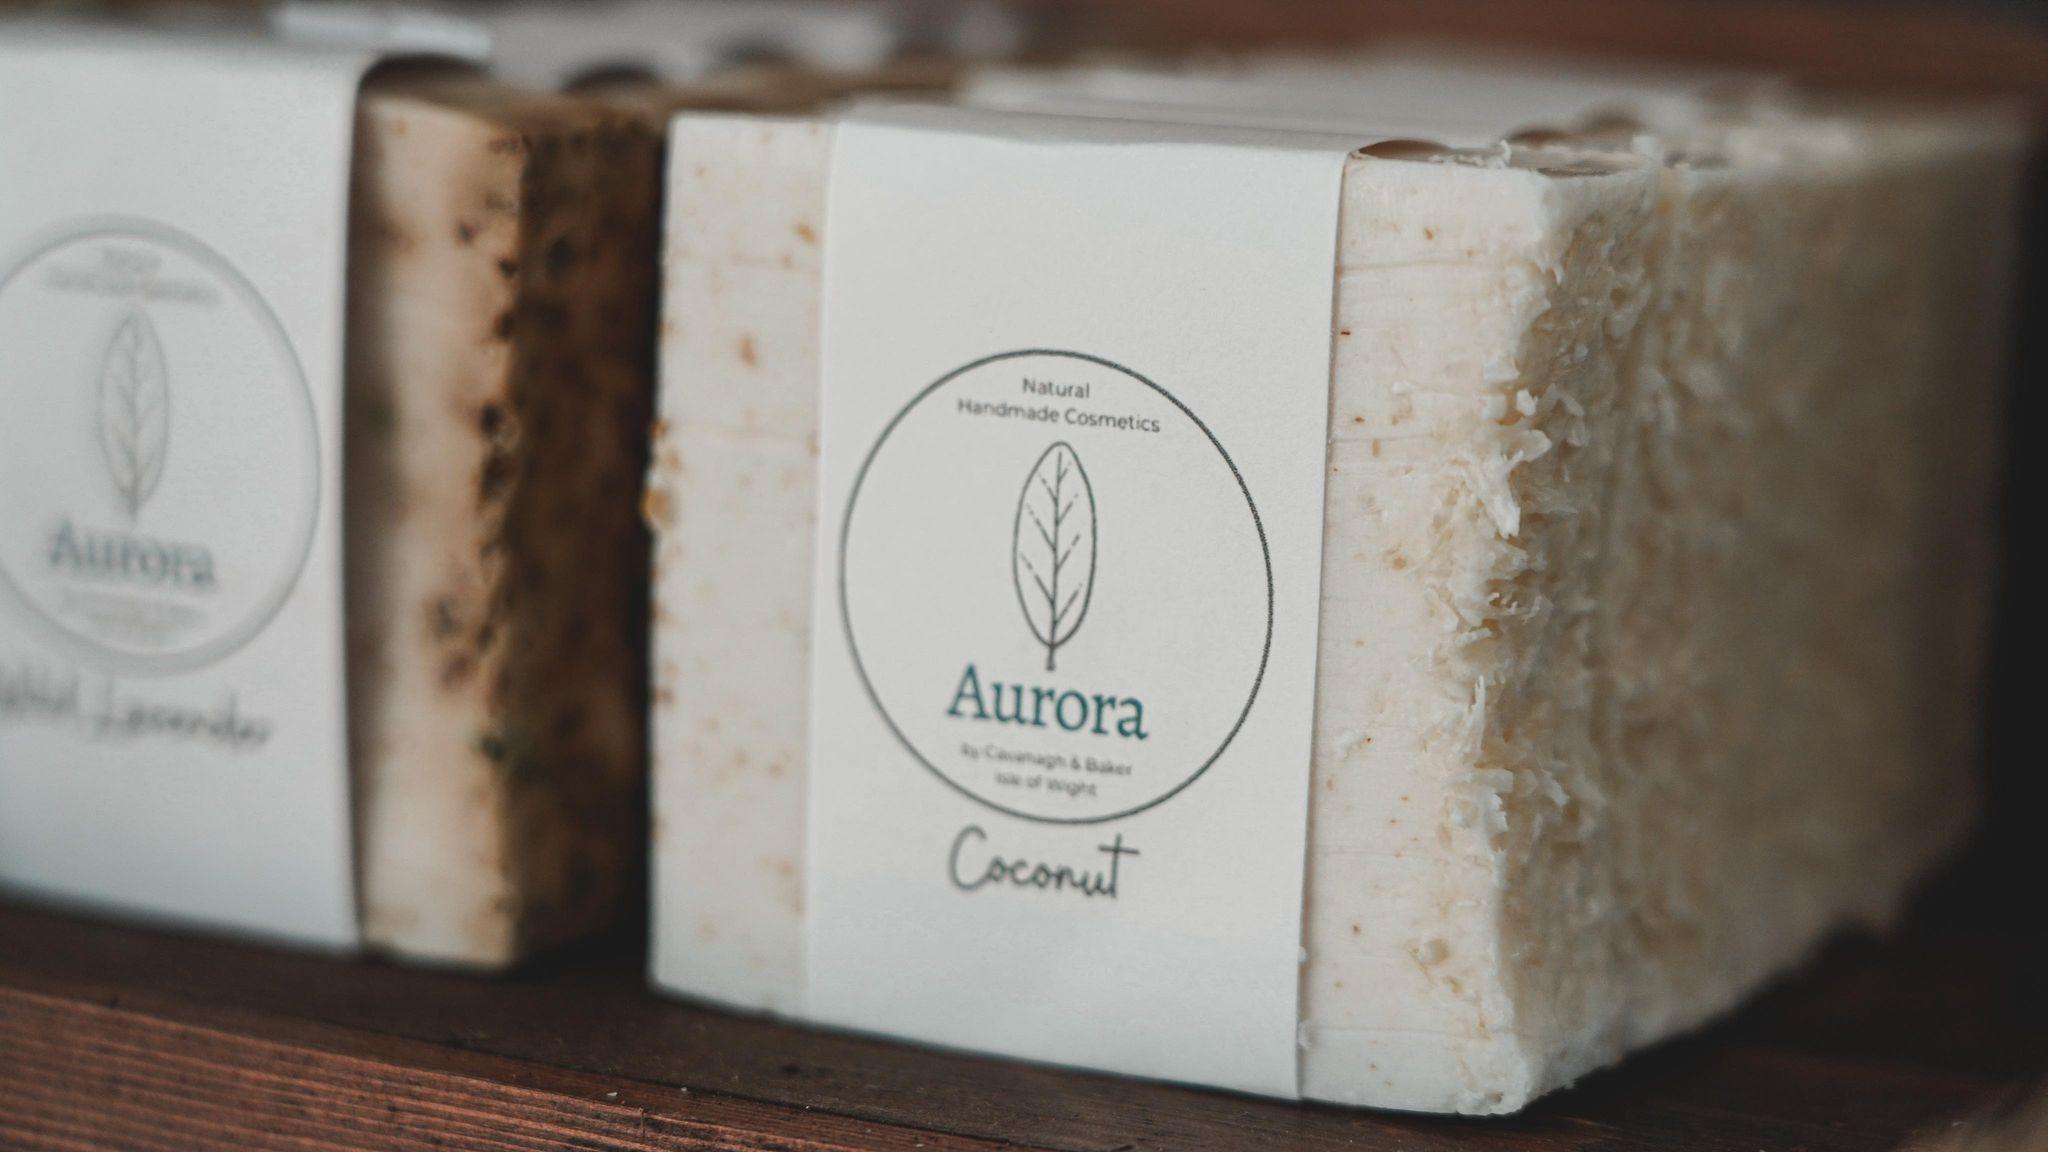 Aurora Handmade Cosmetics